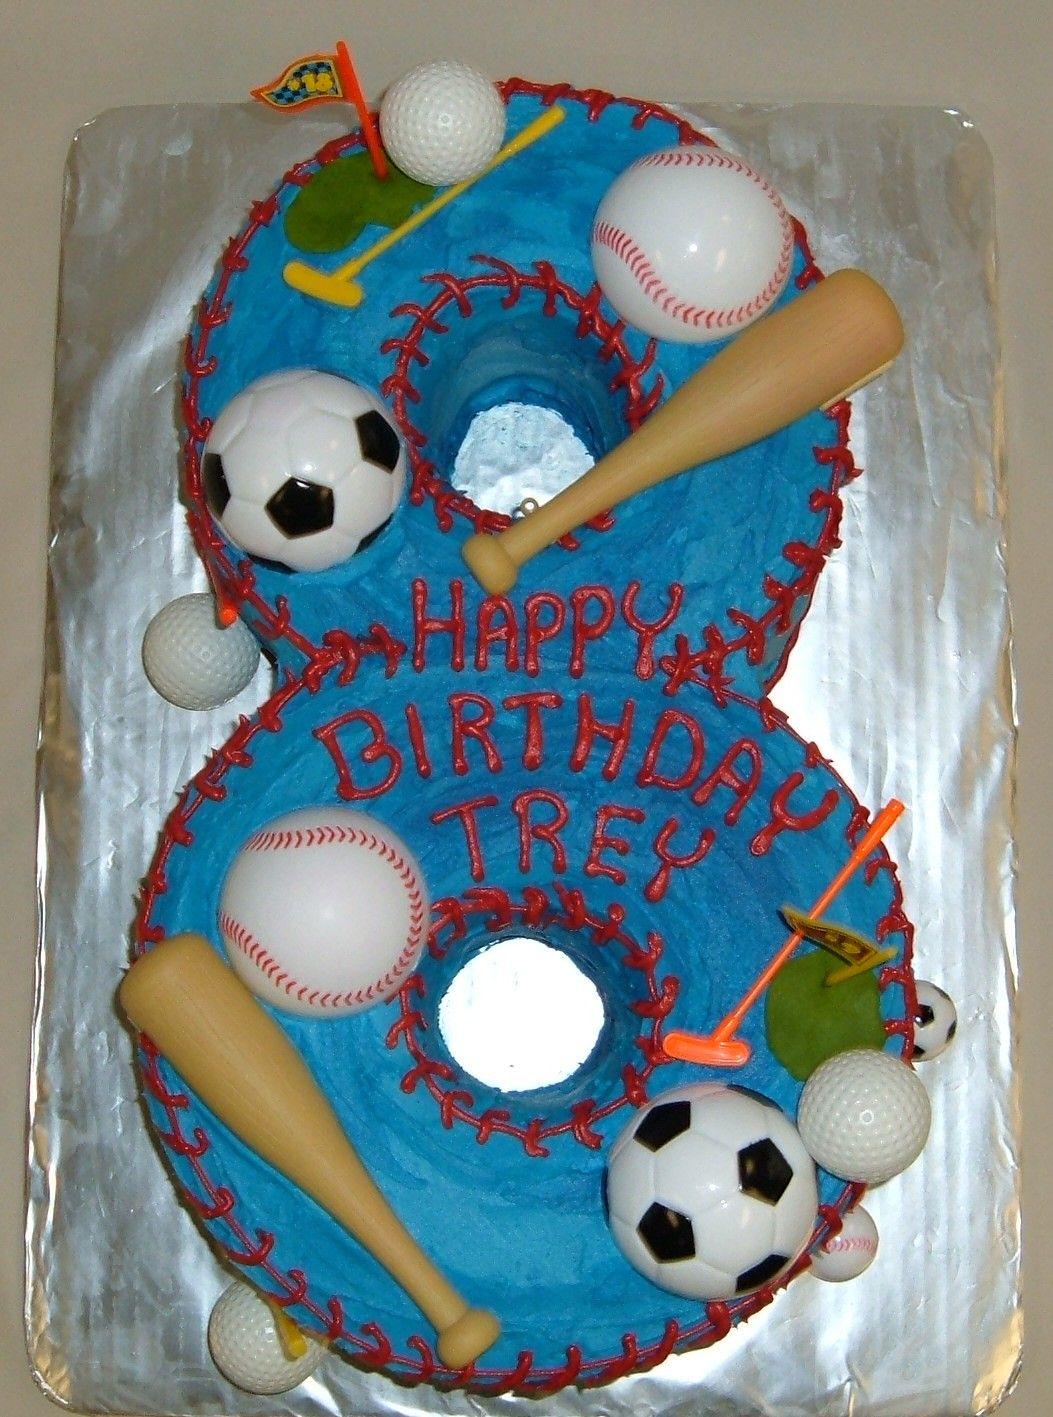 Custom Shaped Numeral Sports Cake Happy 8th Birthday Trey